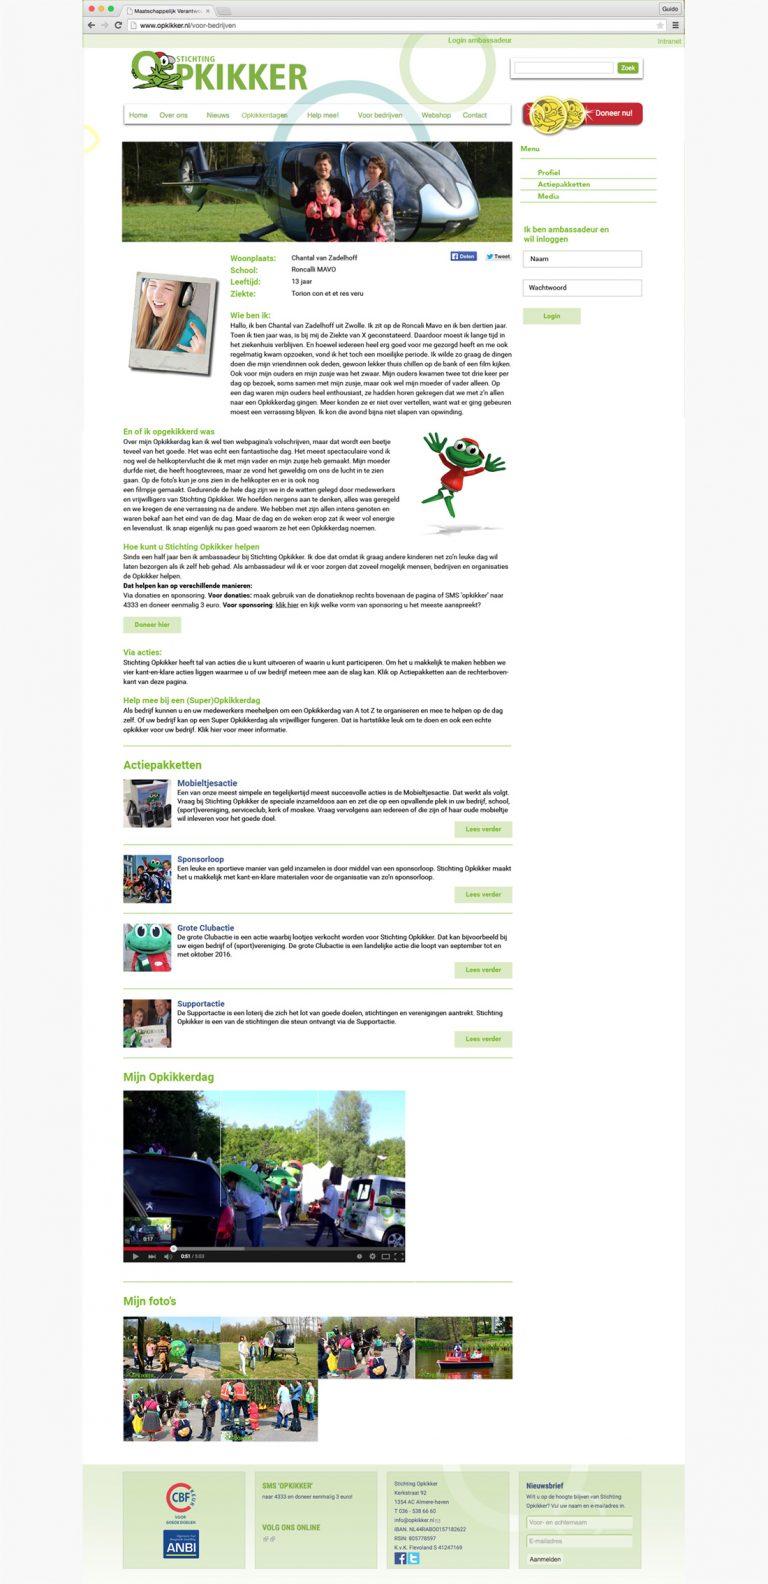 Stichting Opkikker ambassadeur profielpagina